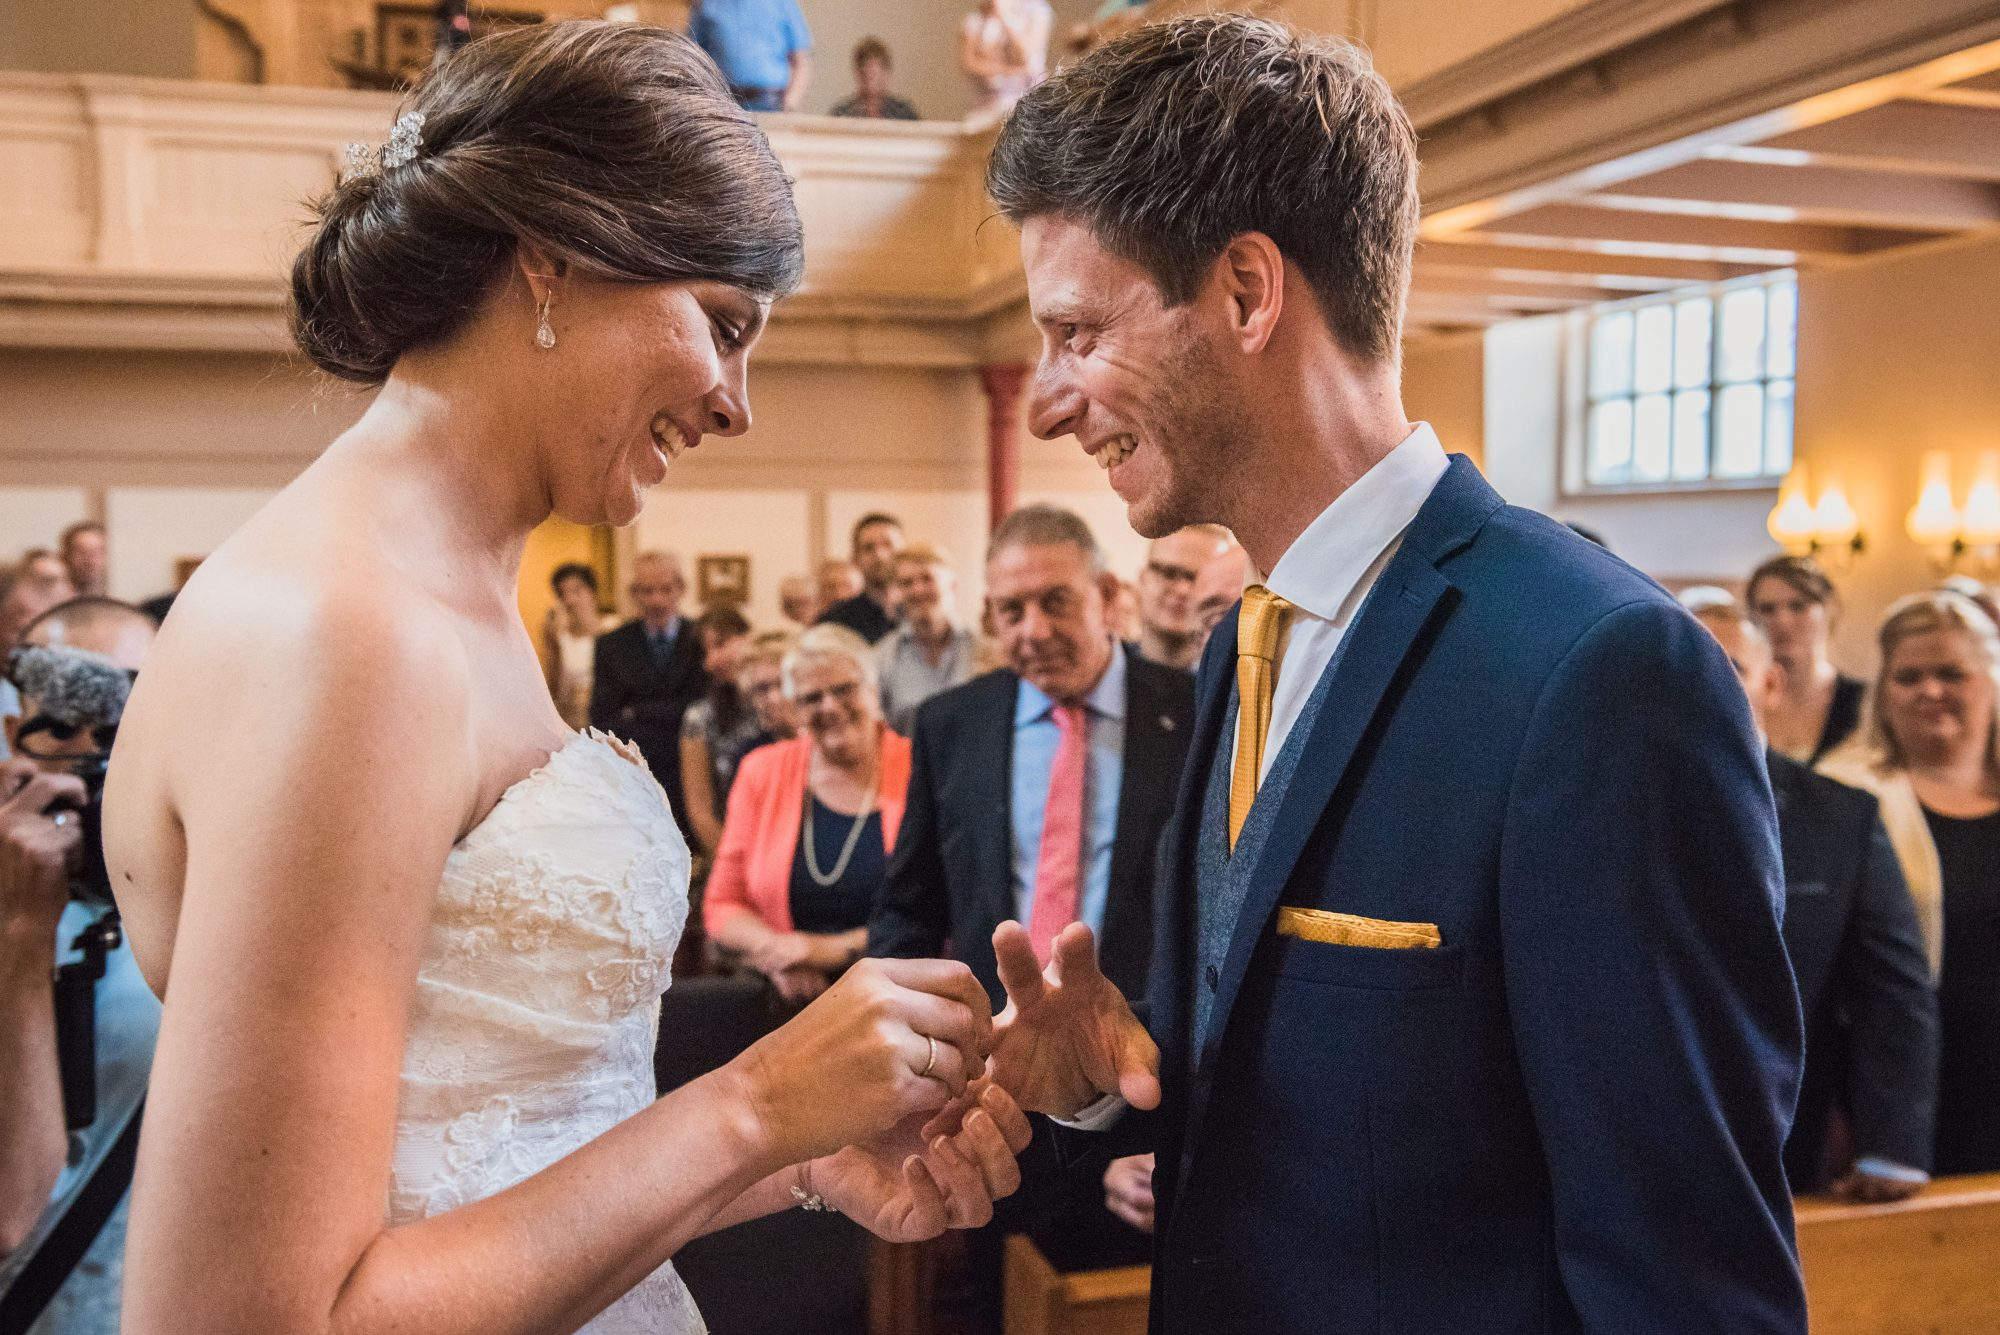 bruiloft-roland-annewil-503